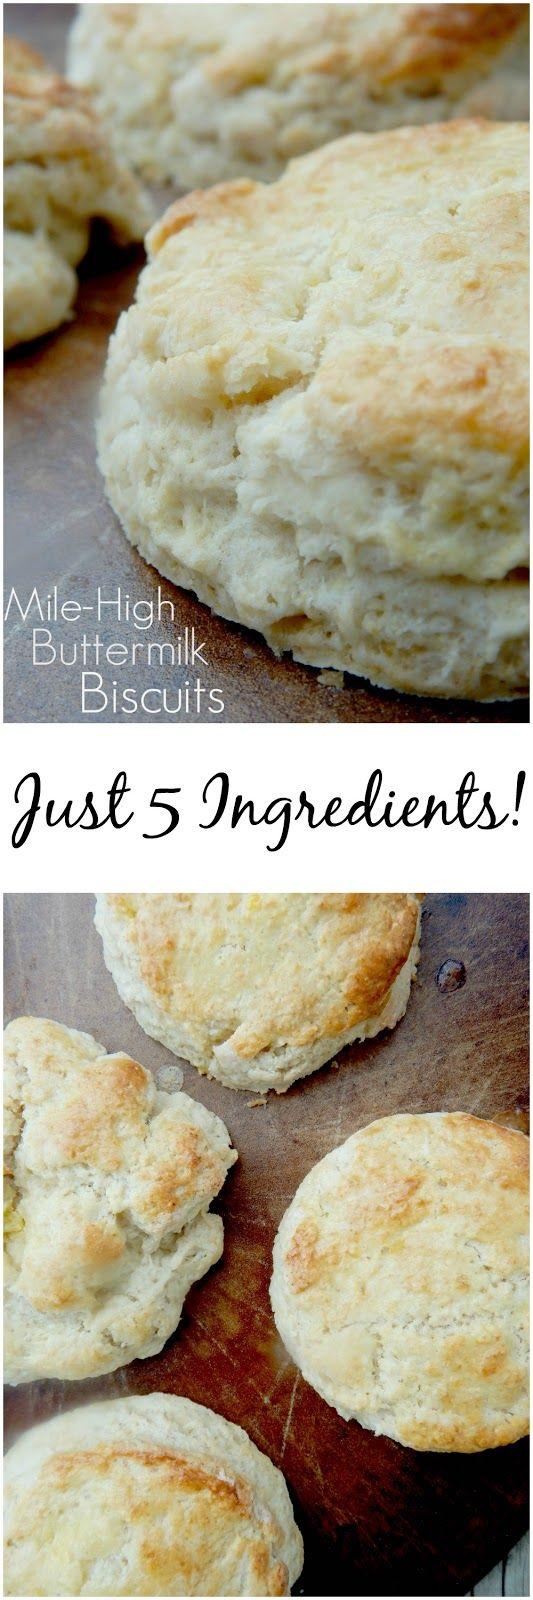 mile high buttermilk biscuits (sweetandsavoryfood.com)